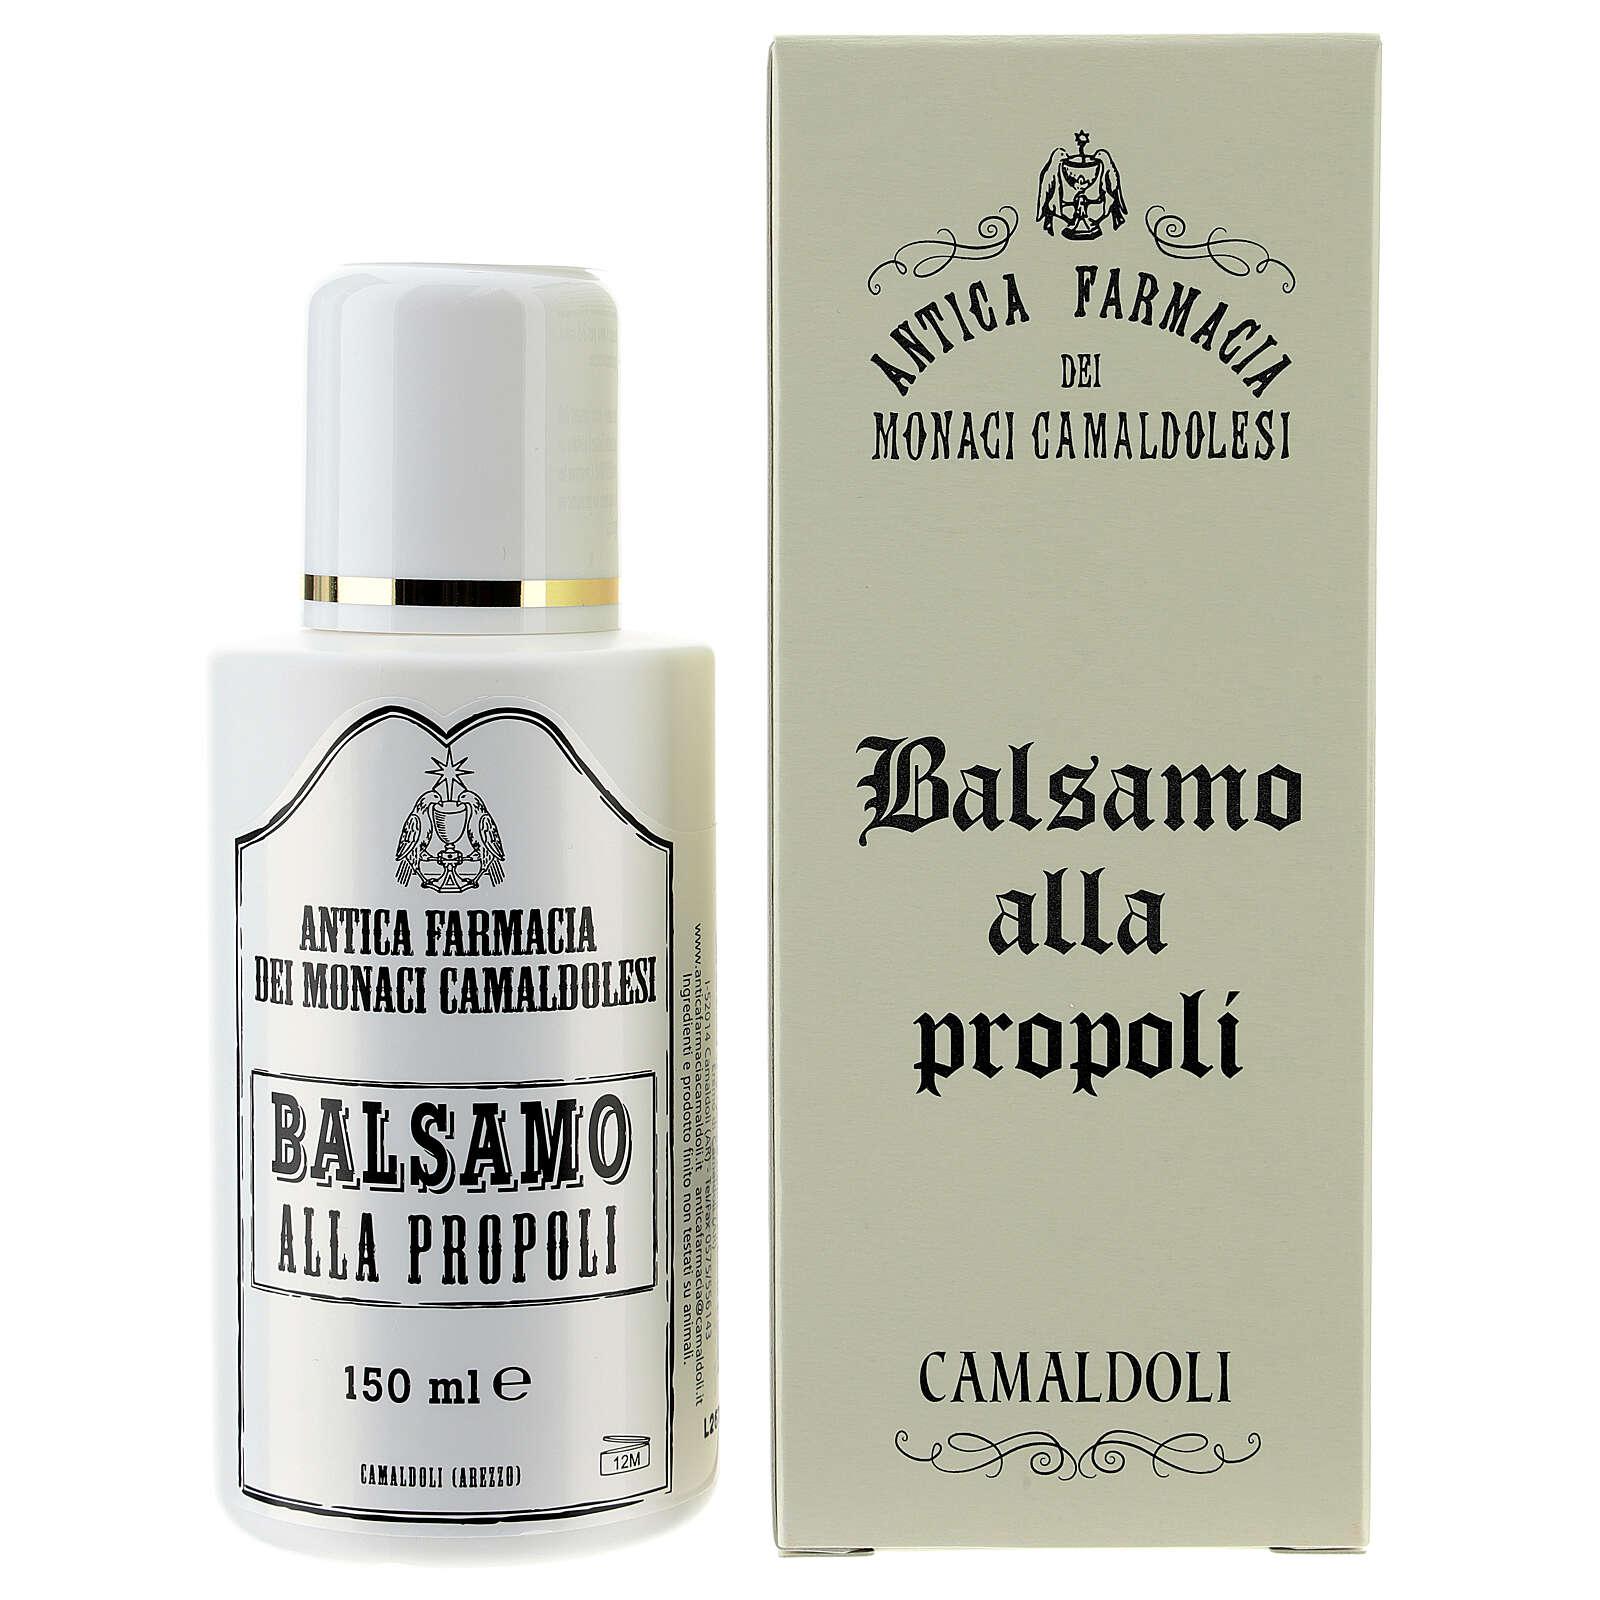 Après-shampoing Propolis 4